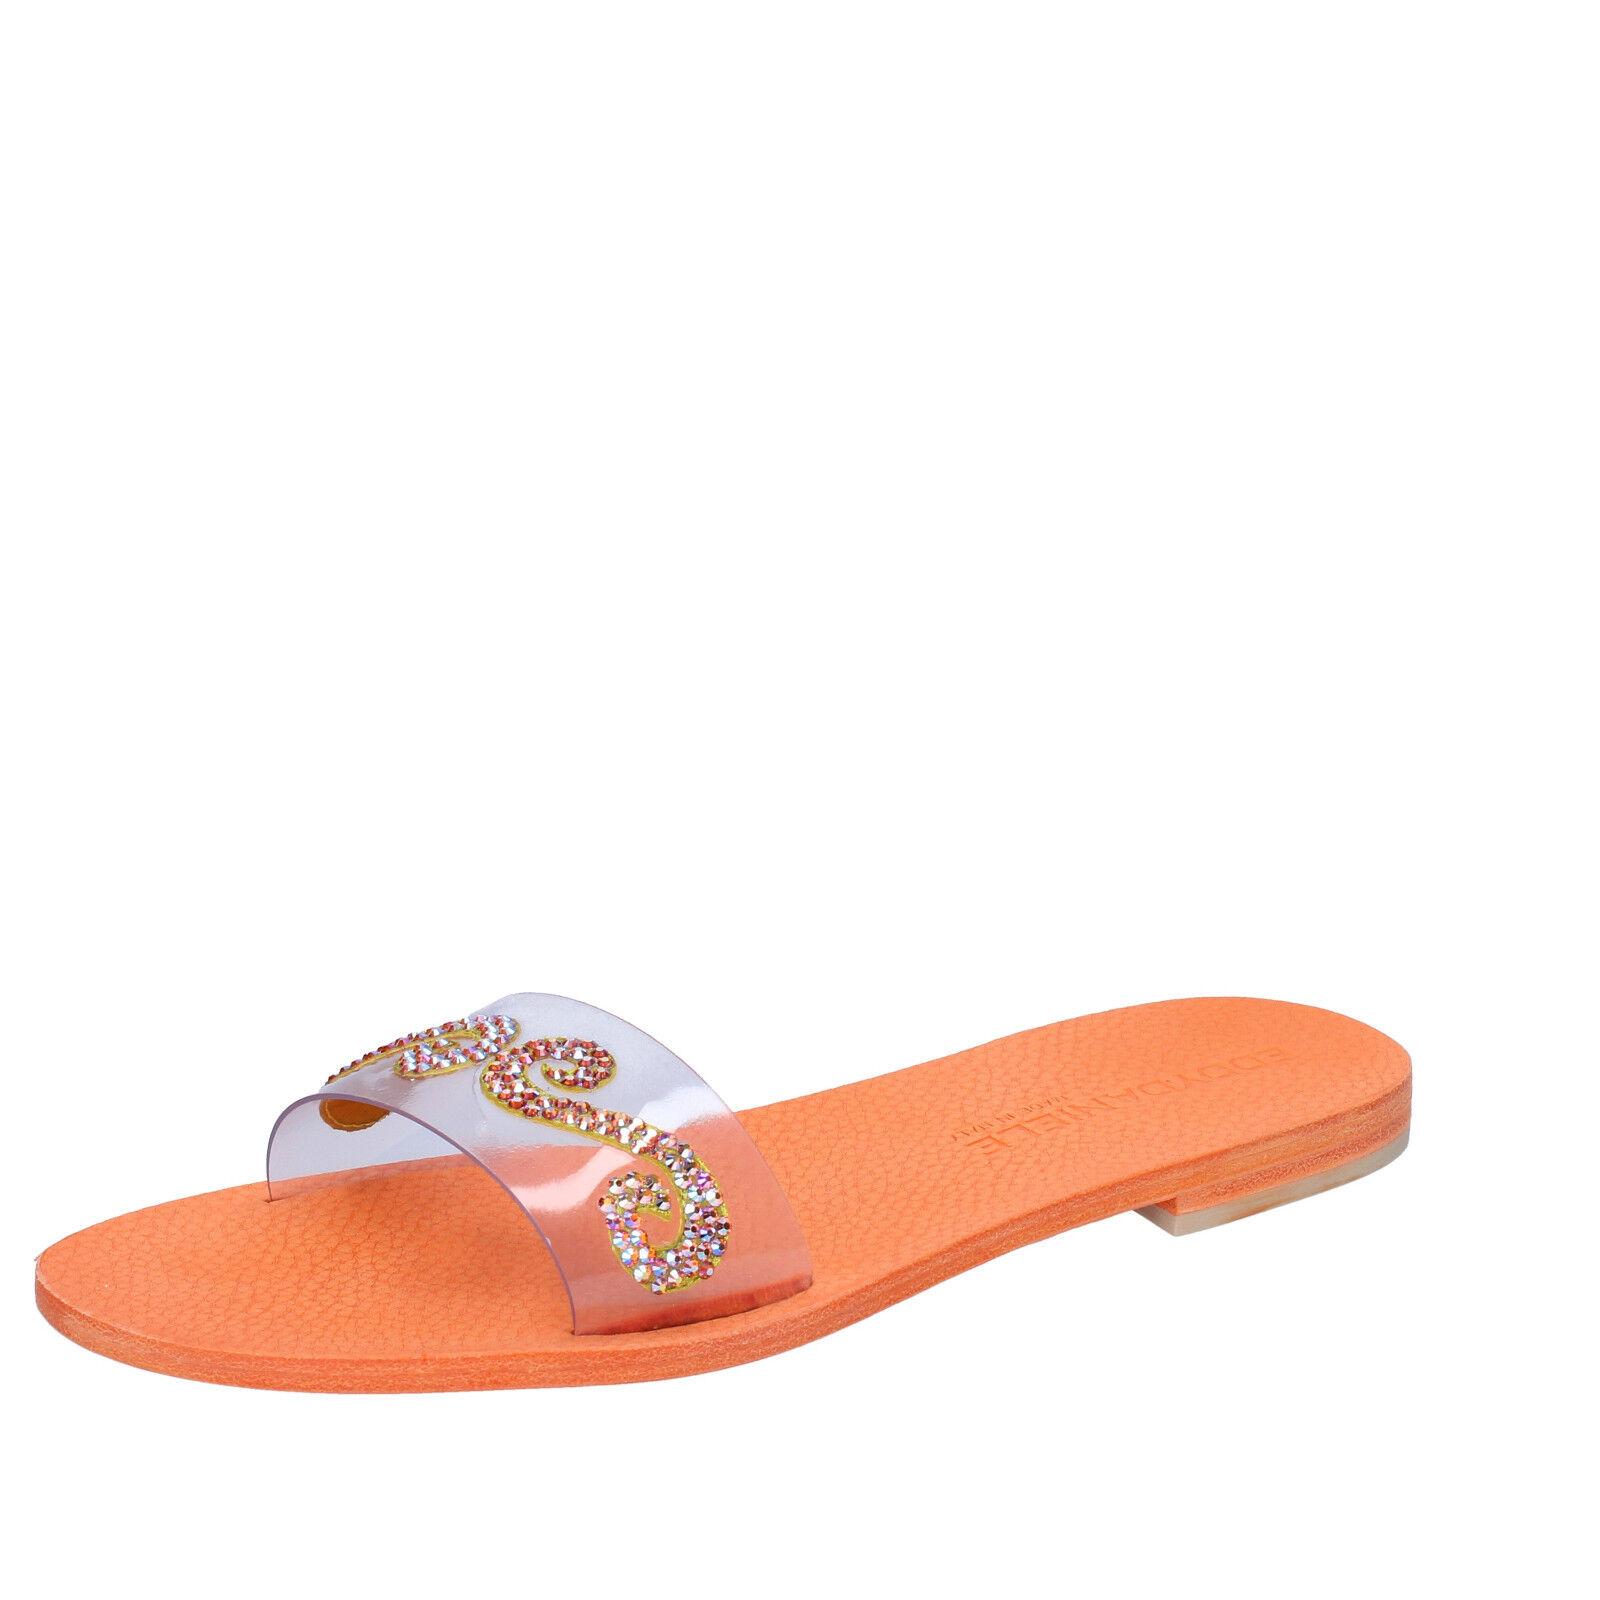 scarpe donna EDDY plastica DANIELE 37 EU sandali arancione plastica EDDY swarovski AW448 c69218